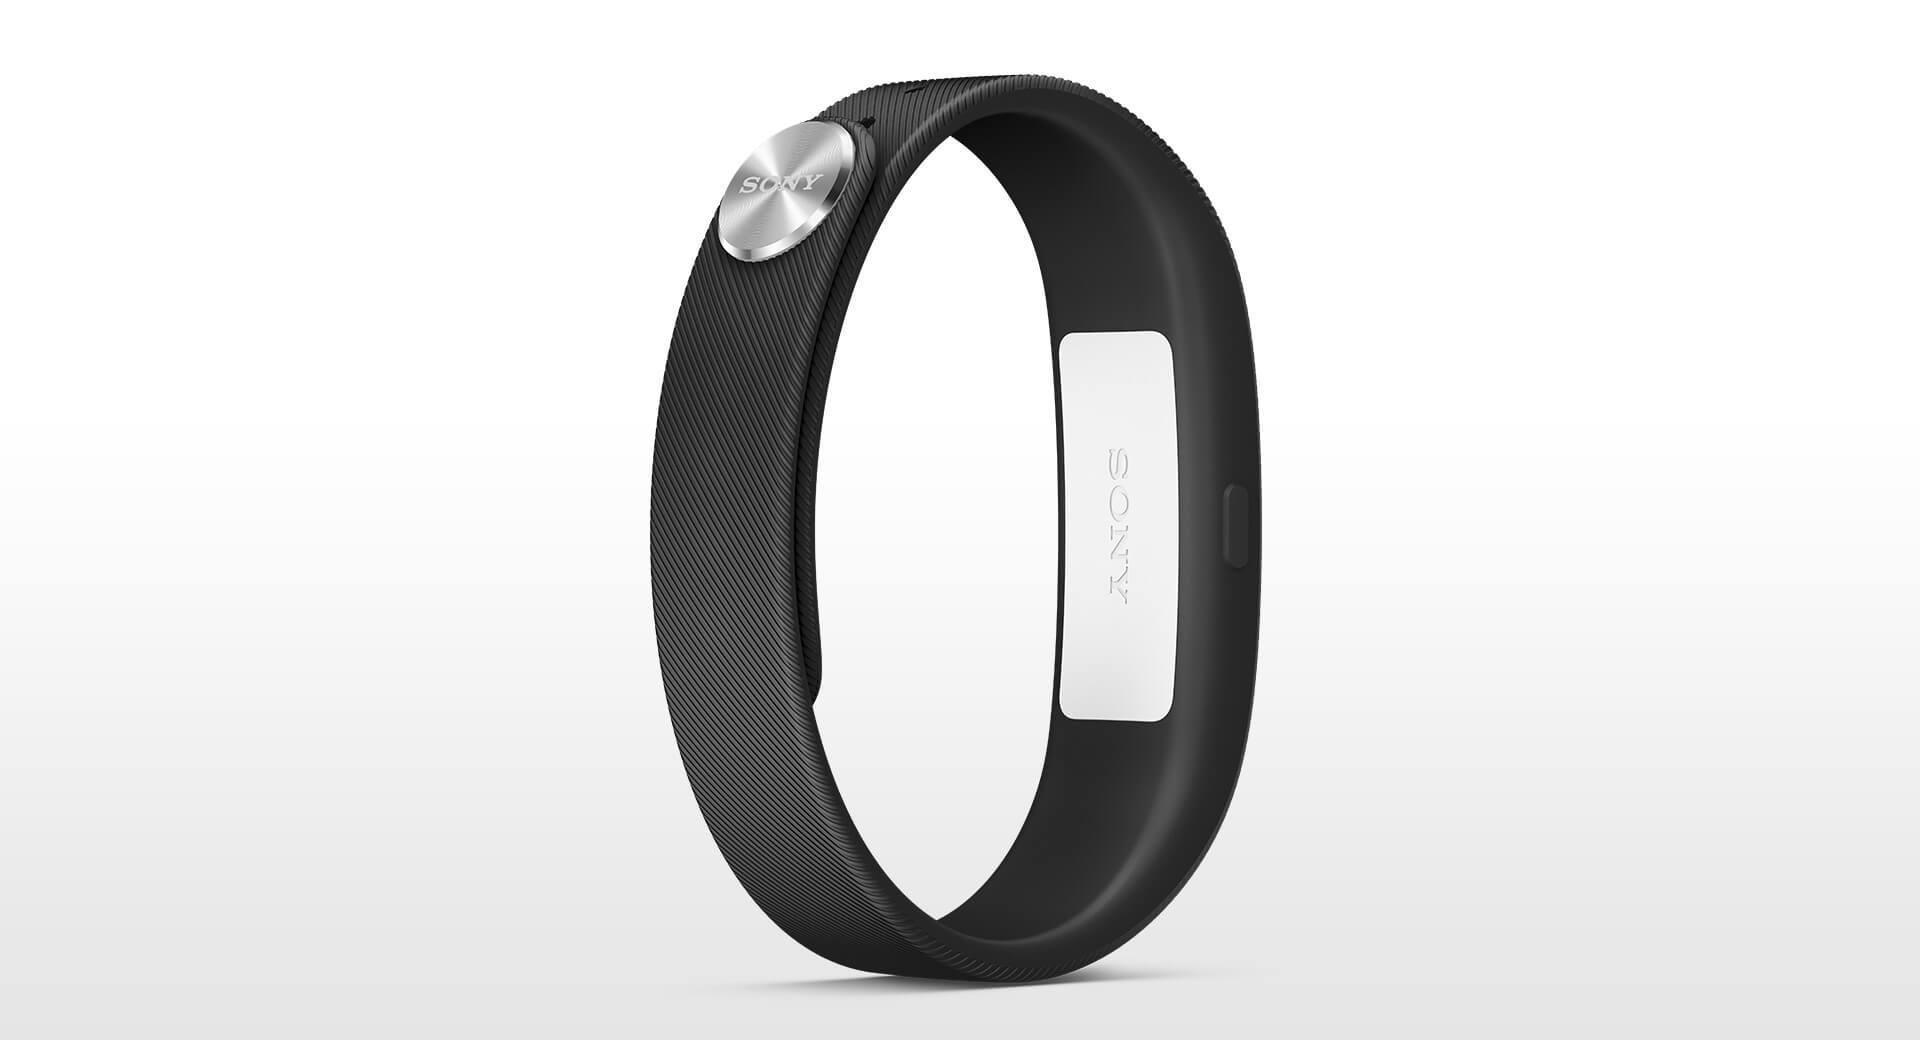 http://www.sonymobile.co.jp/product/smartwear/swr10/img/main.jpg